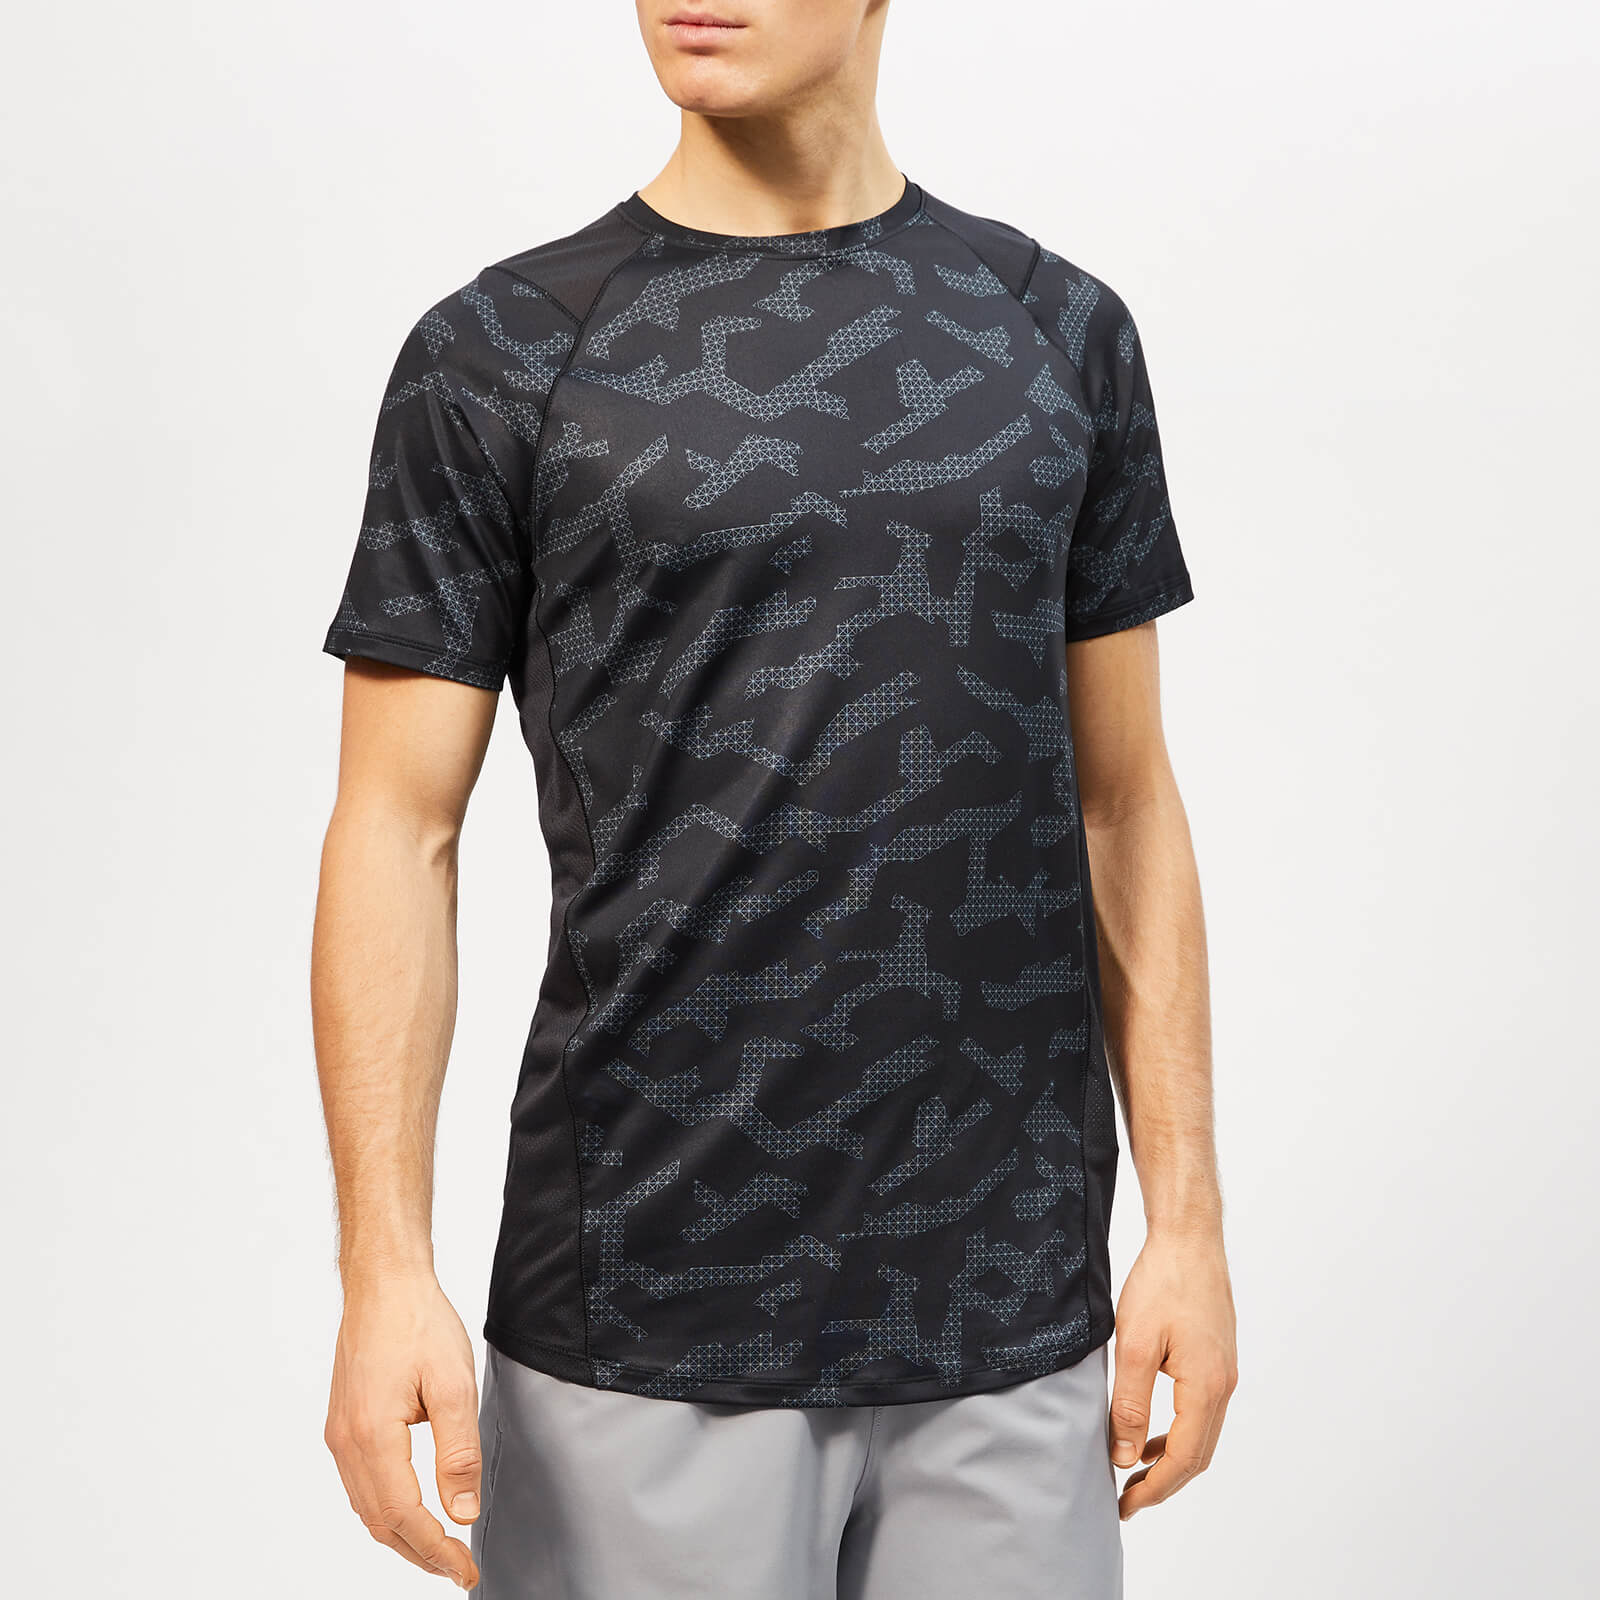 e6423601 Under Armour Men's MK-1 Short Sleeve Printed T-Shirt - Black